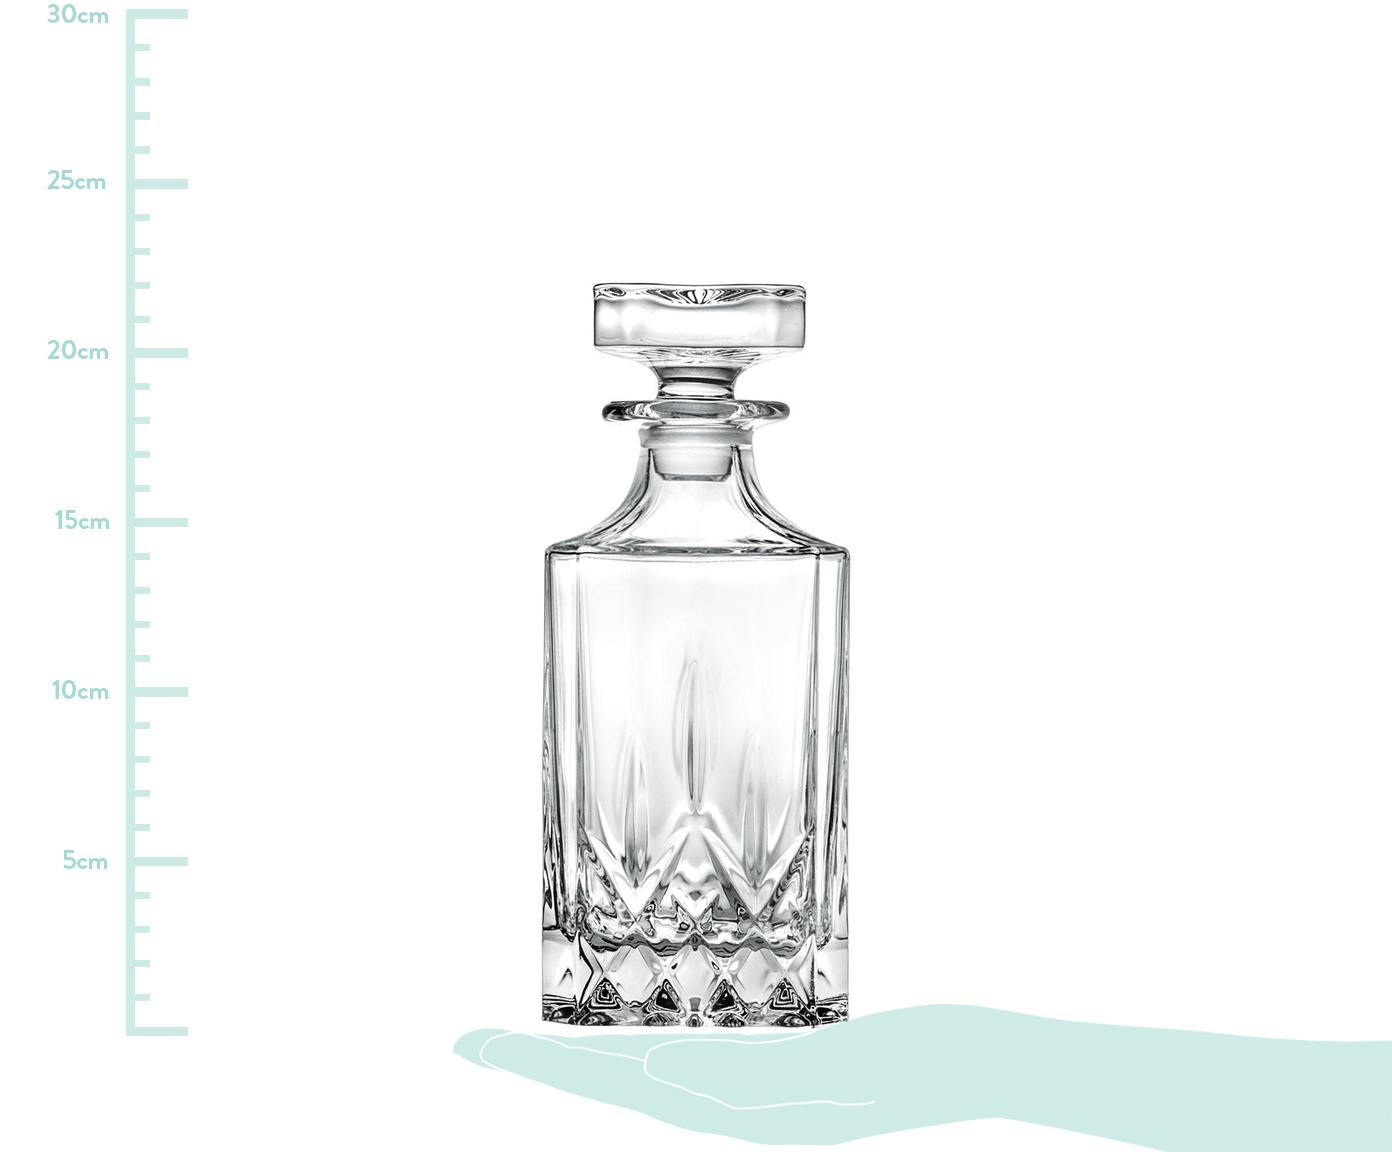 Kristall-Dekanter Opera mit Reliefmuster, Kristallglas, Transparent, H 22 cm